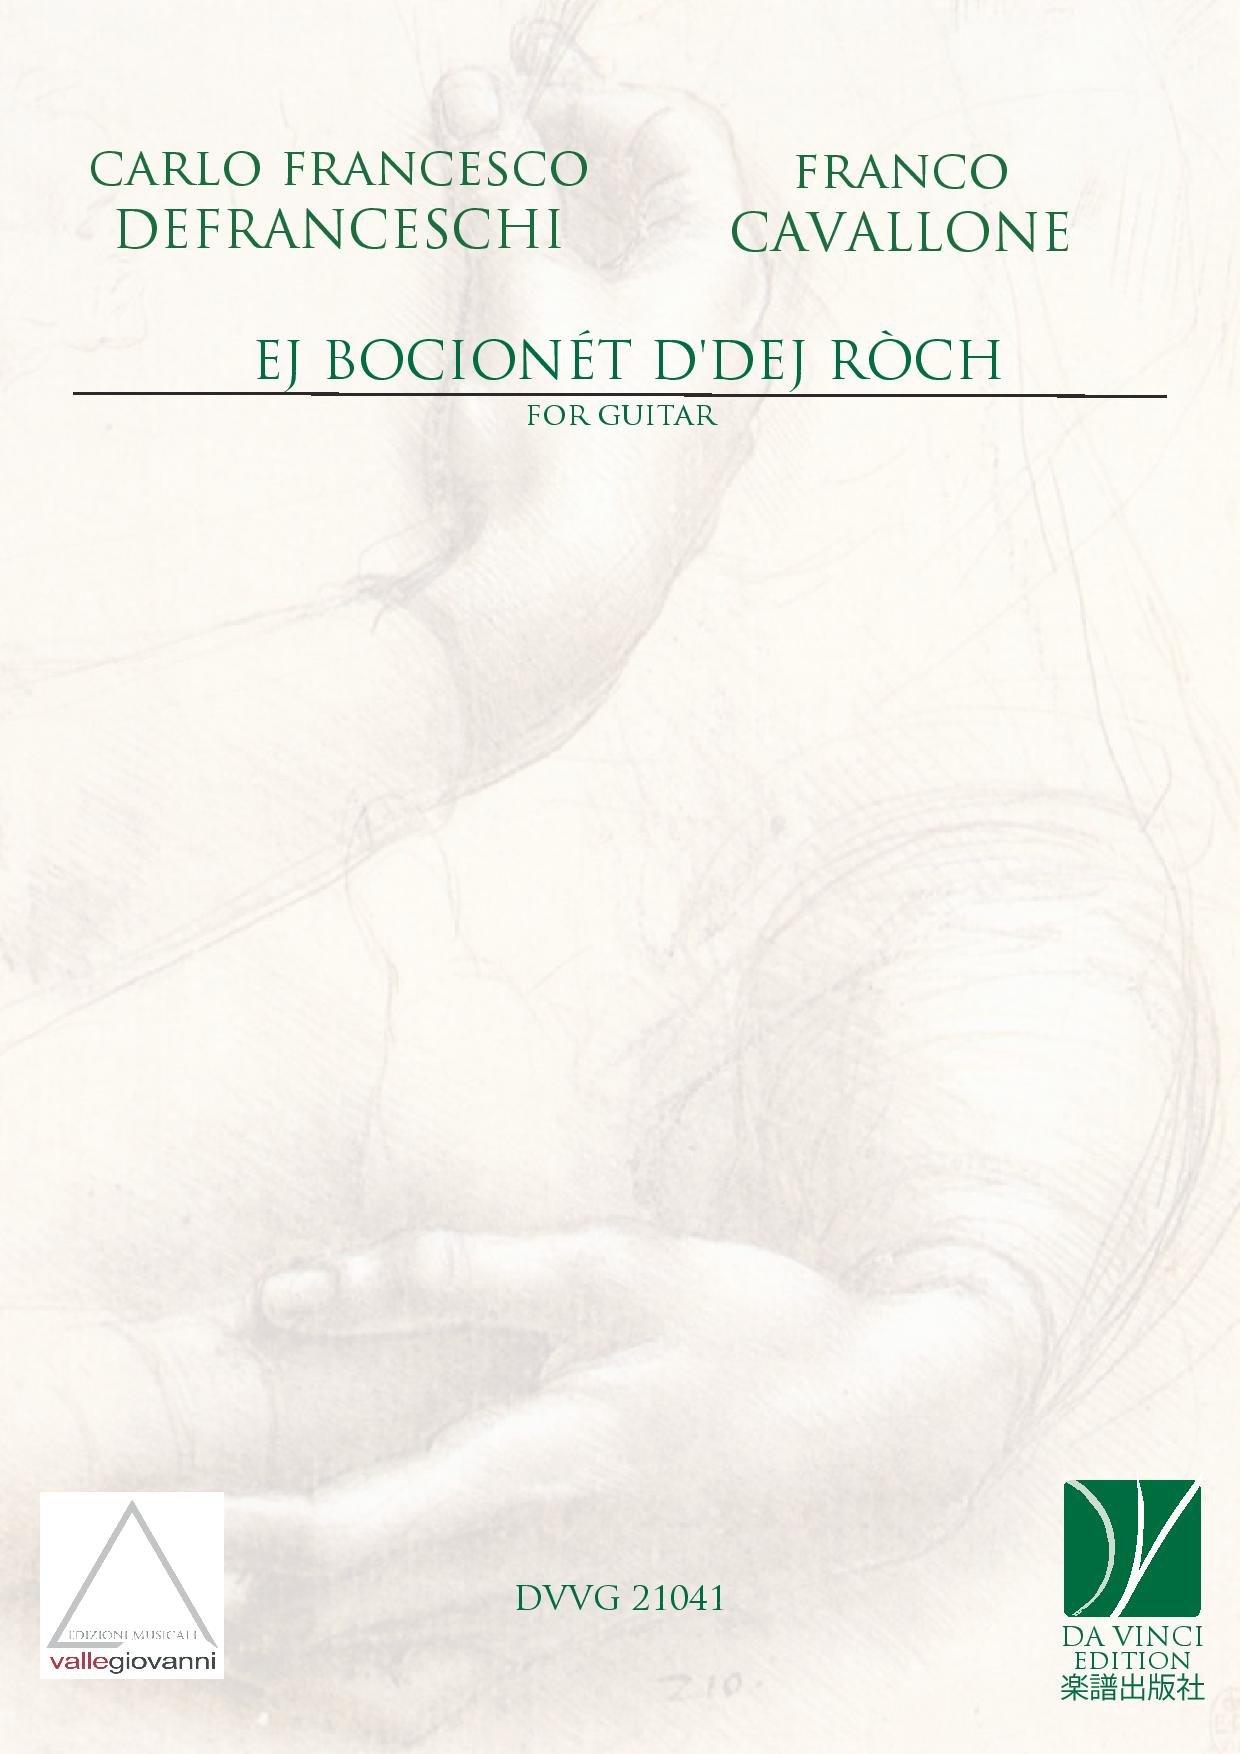 Ej bocionèt d'dej ròch -omaggio ad Angelo Gilardino